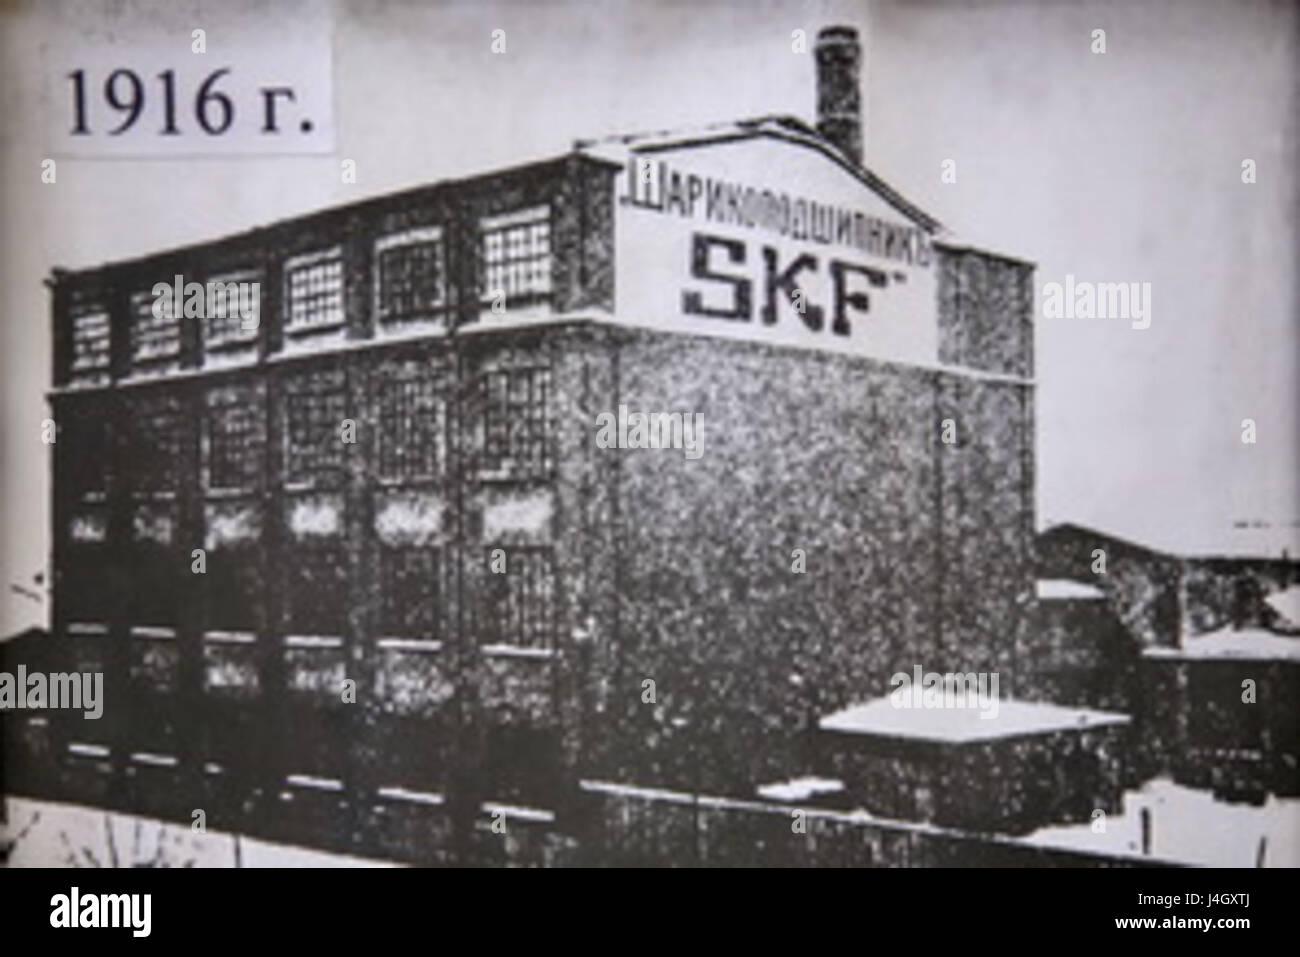 SKF 2GPZ - Stock Image